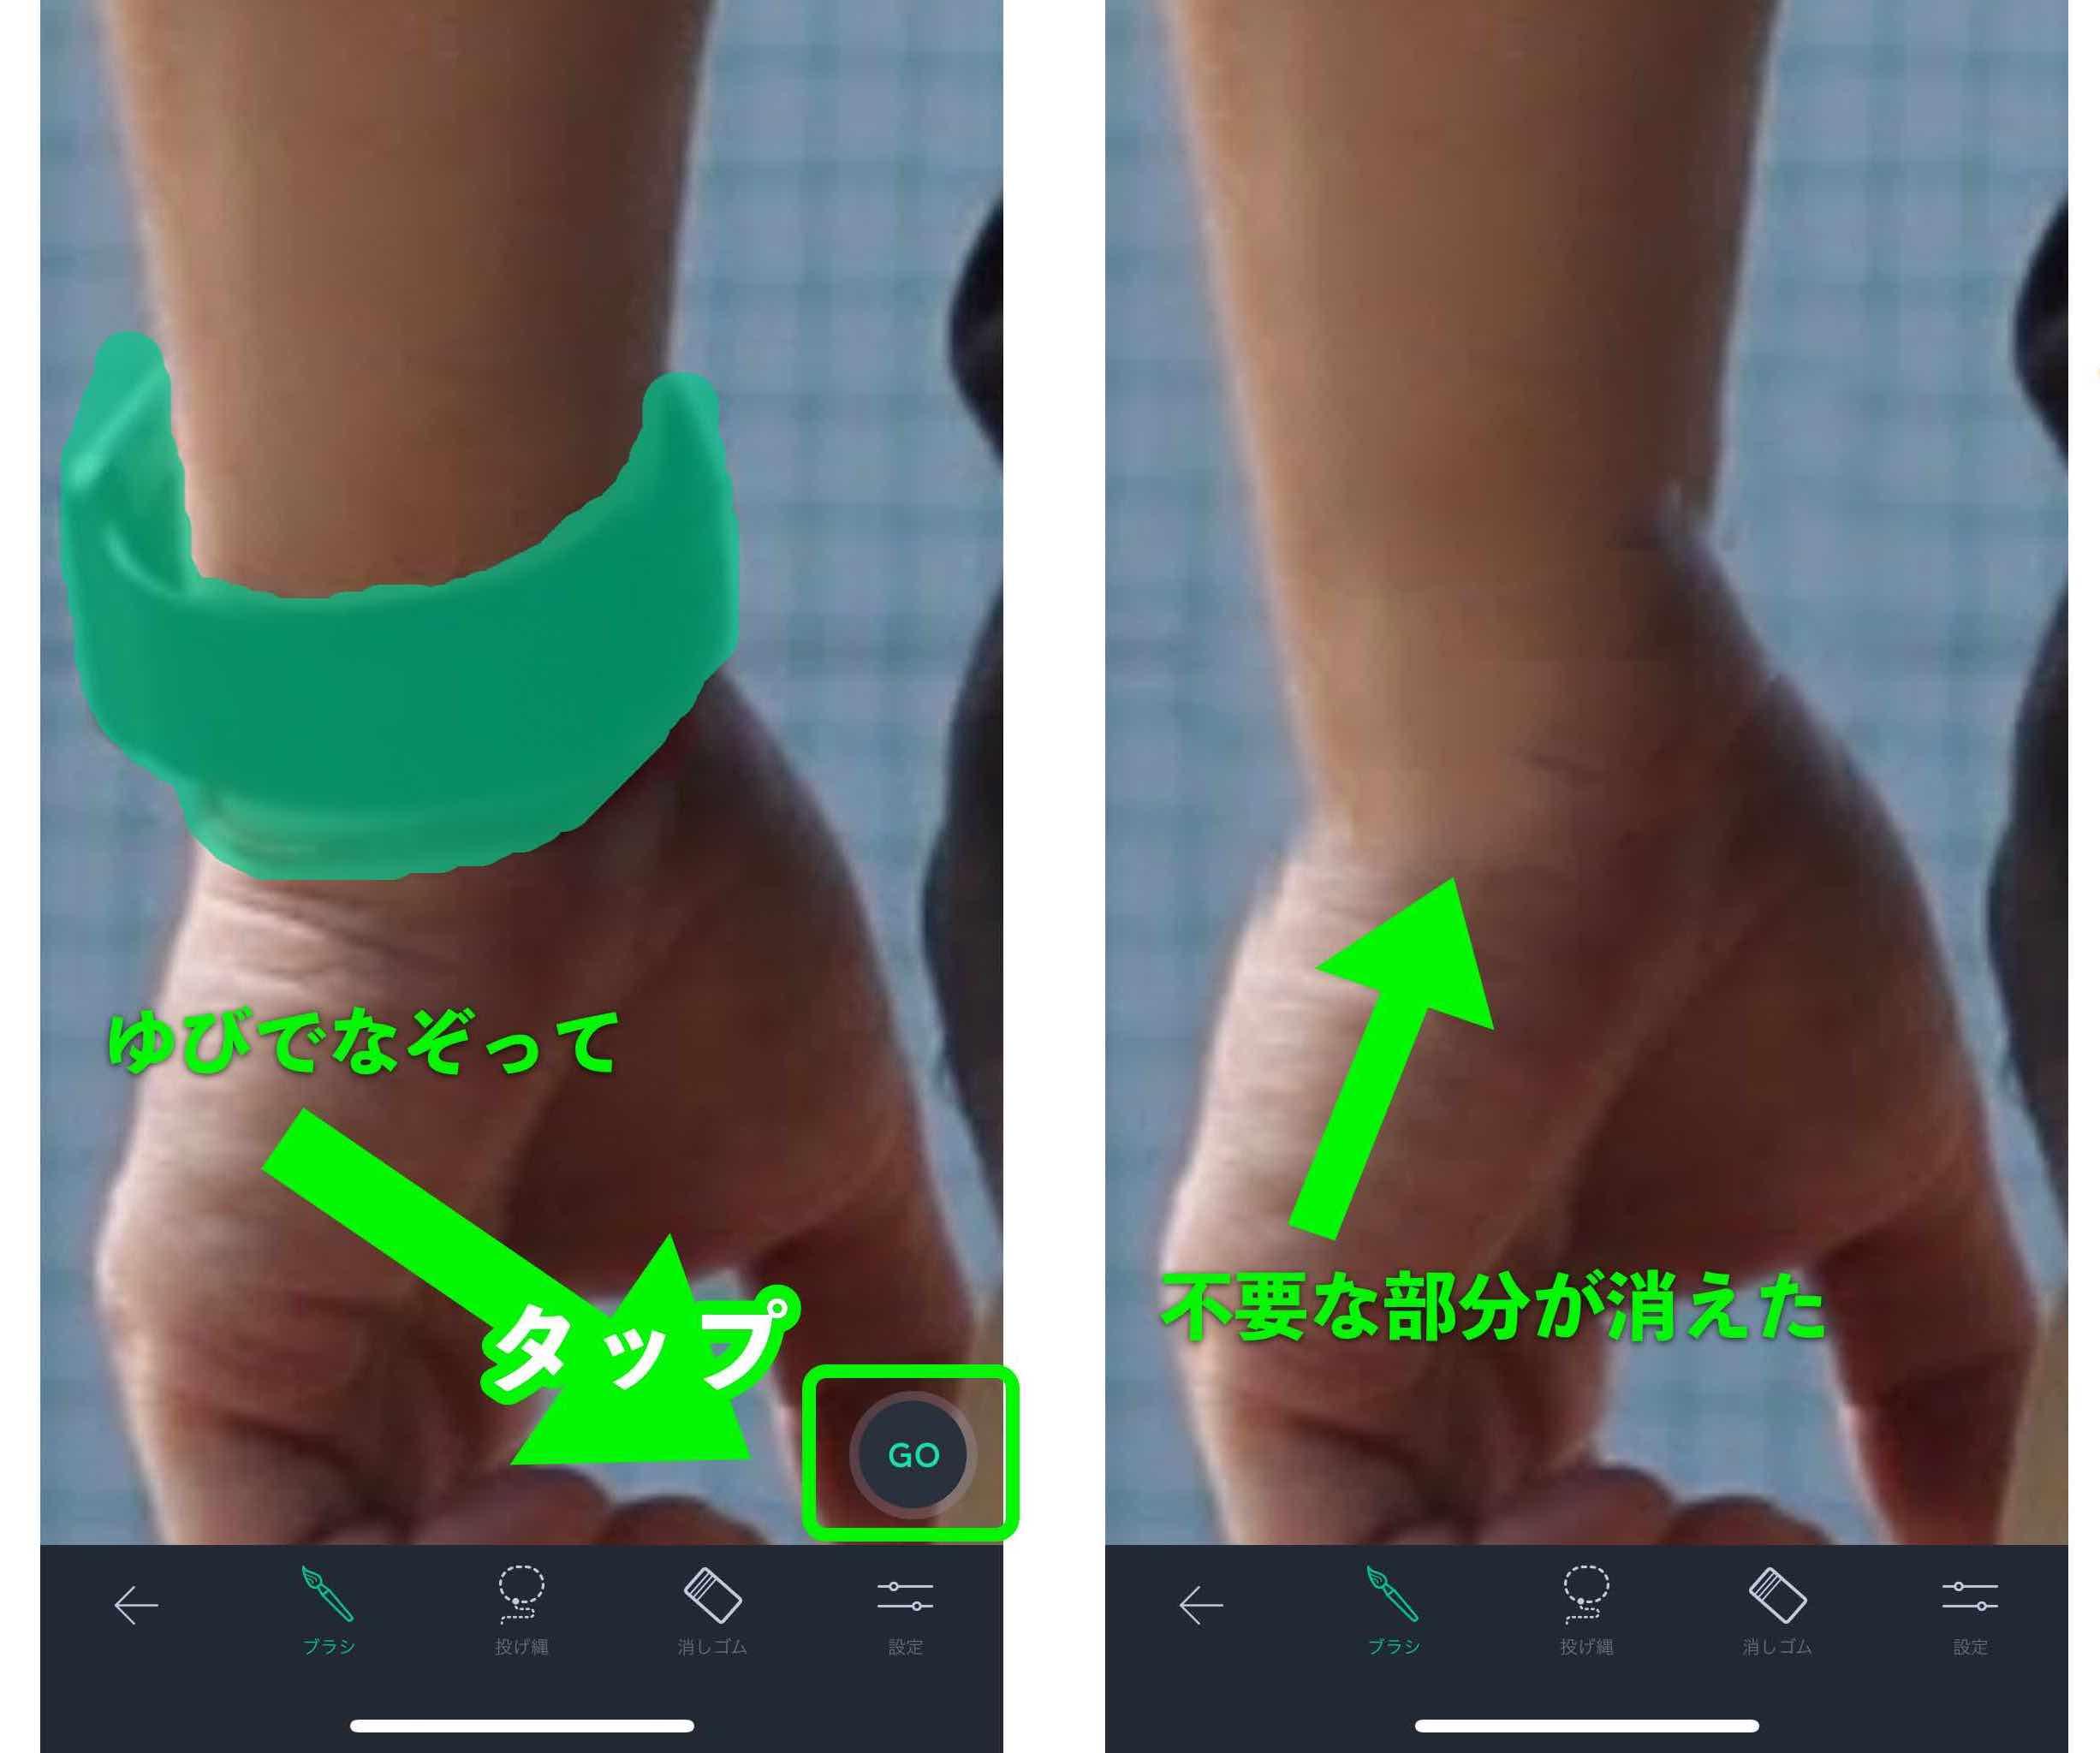 TouchRetouch使い方⑥の画像